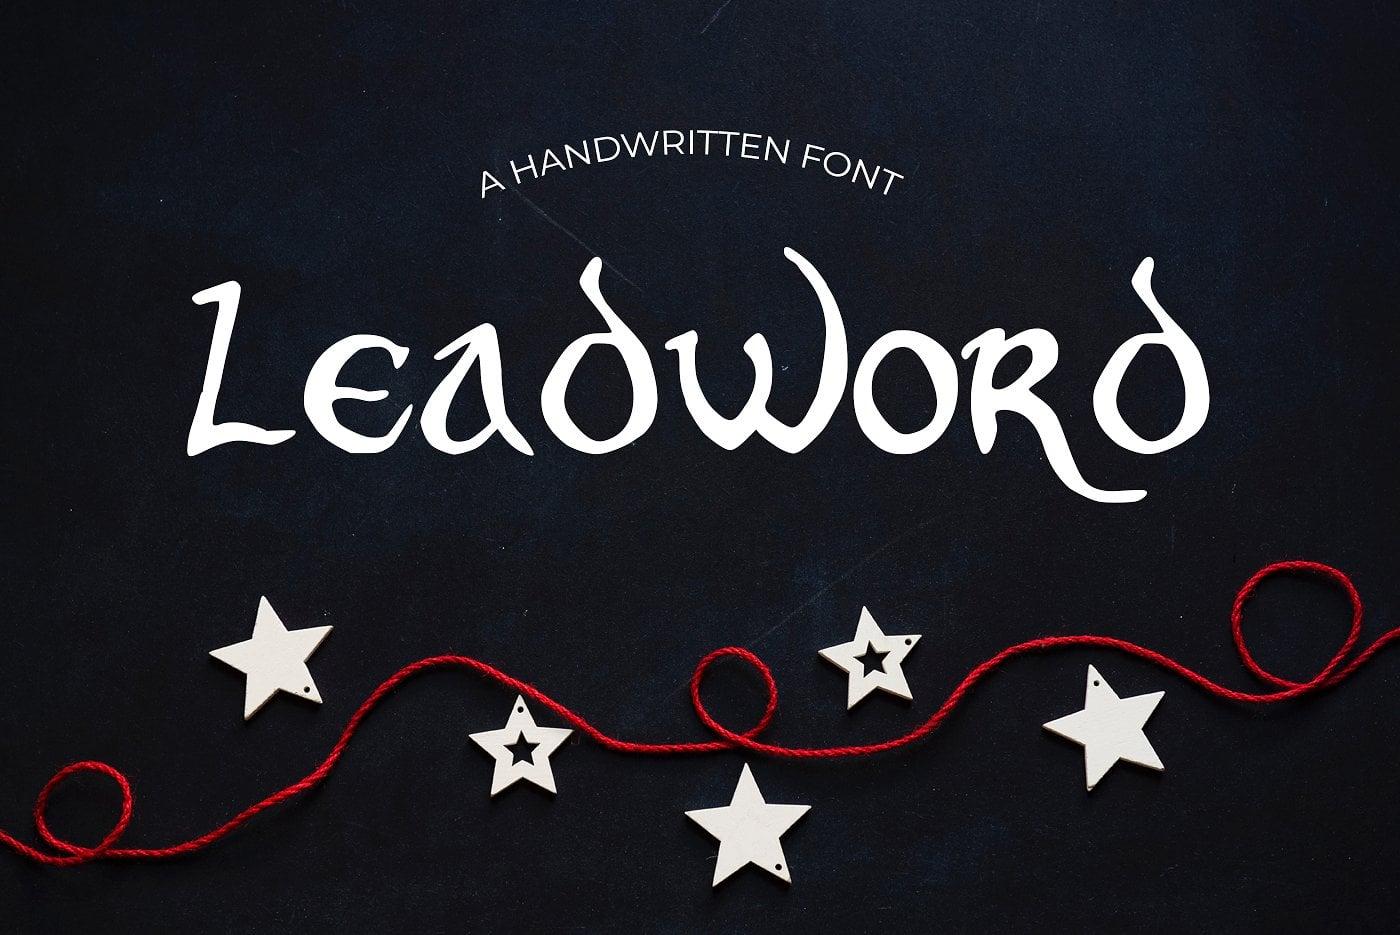 15 Creative Handmade Fonts - $19 ONLY - main image. 9